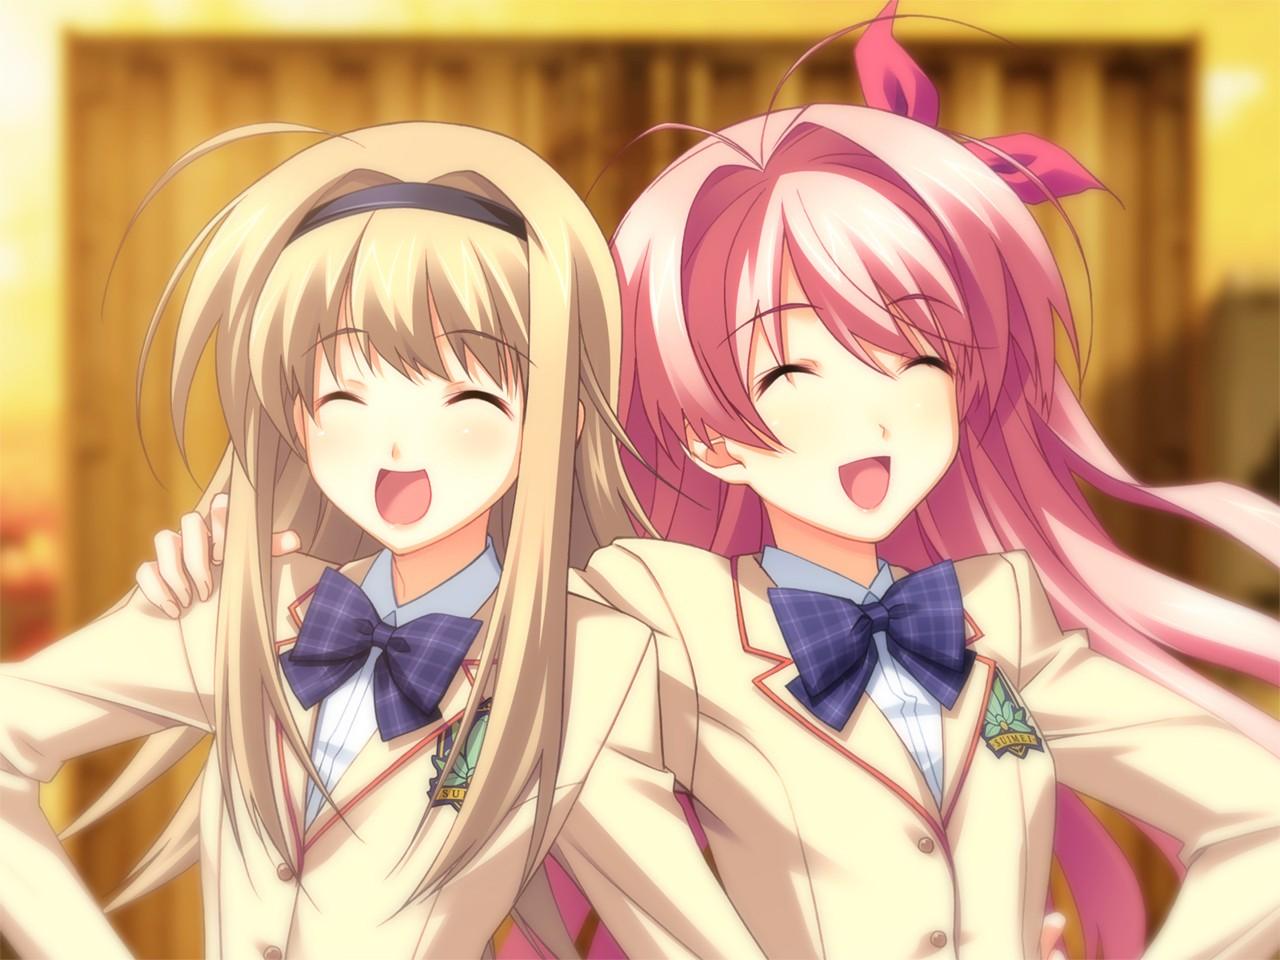 Anime 1280x960 Chaos;Head anime school uniform Sakihata Rimi Nishijou Nanami anime girls